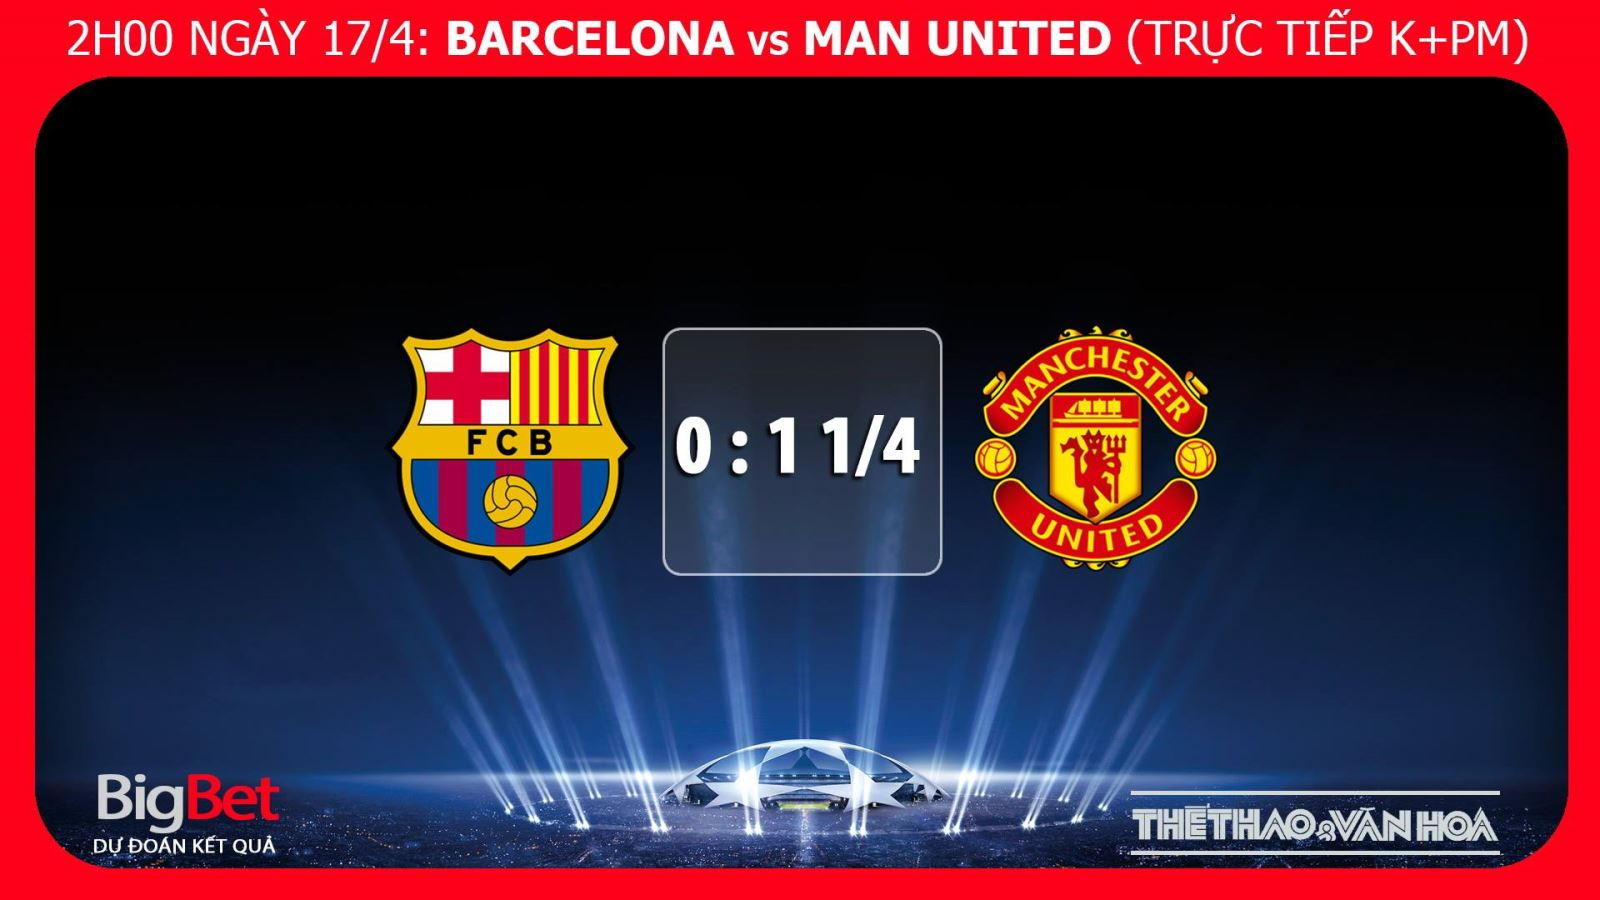 Barcelona, MU, trực tiếp Barca vs MU, soi kèo barca vs mu, nhận định barca vs mu, xem trực tiếp barca vs mu